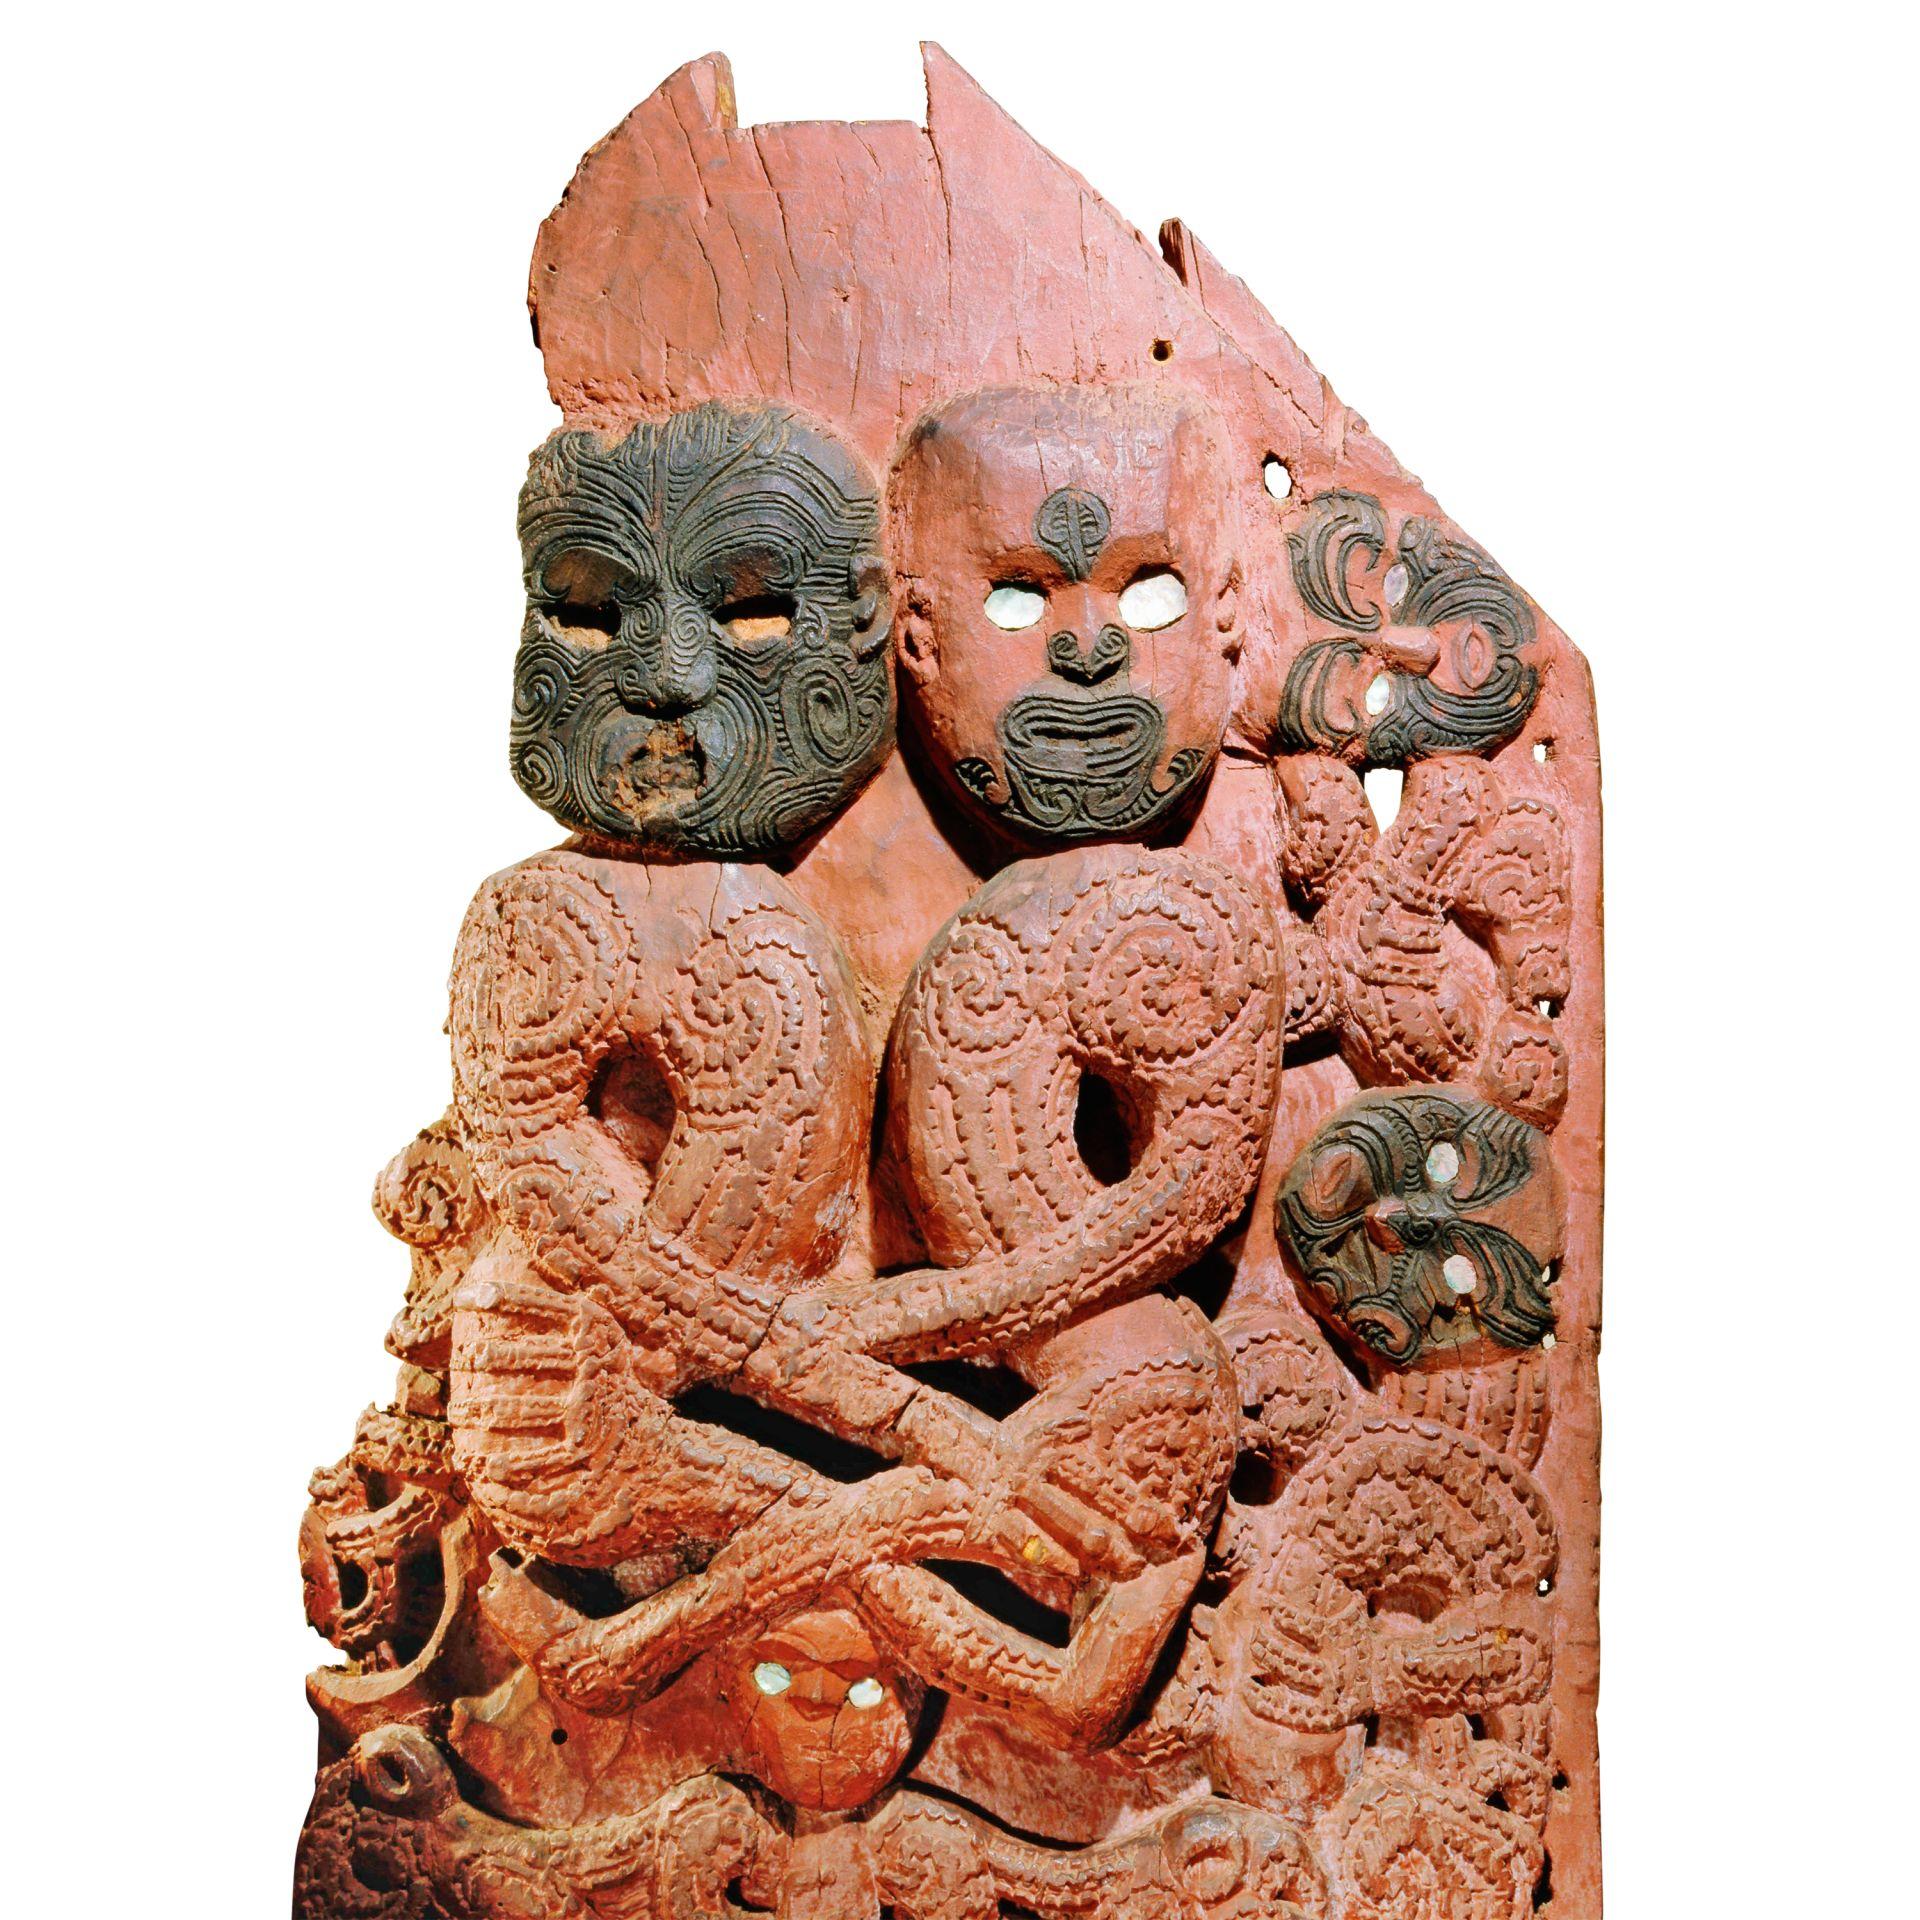 Maori Beliefs: Maori Beliefs And Traditions